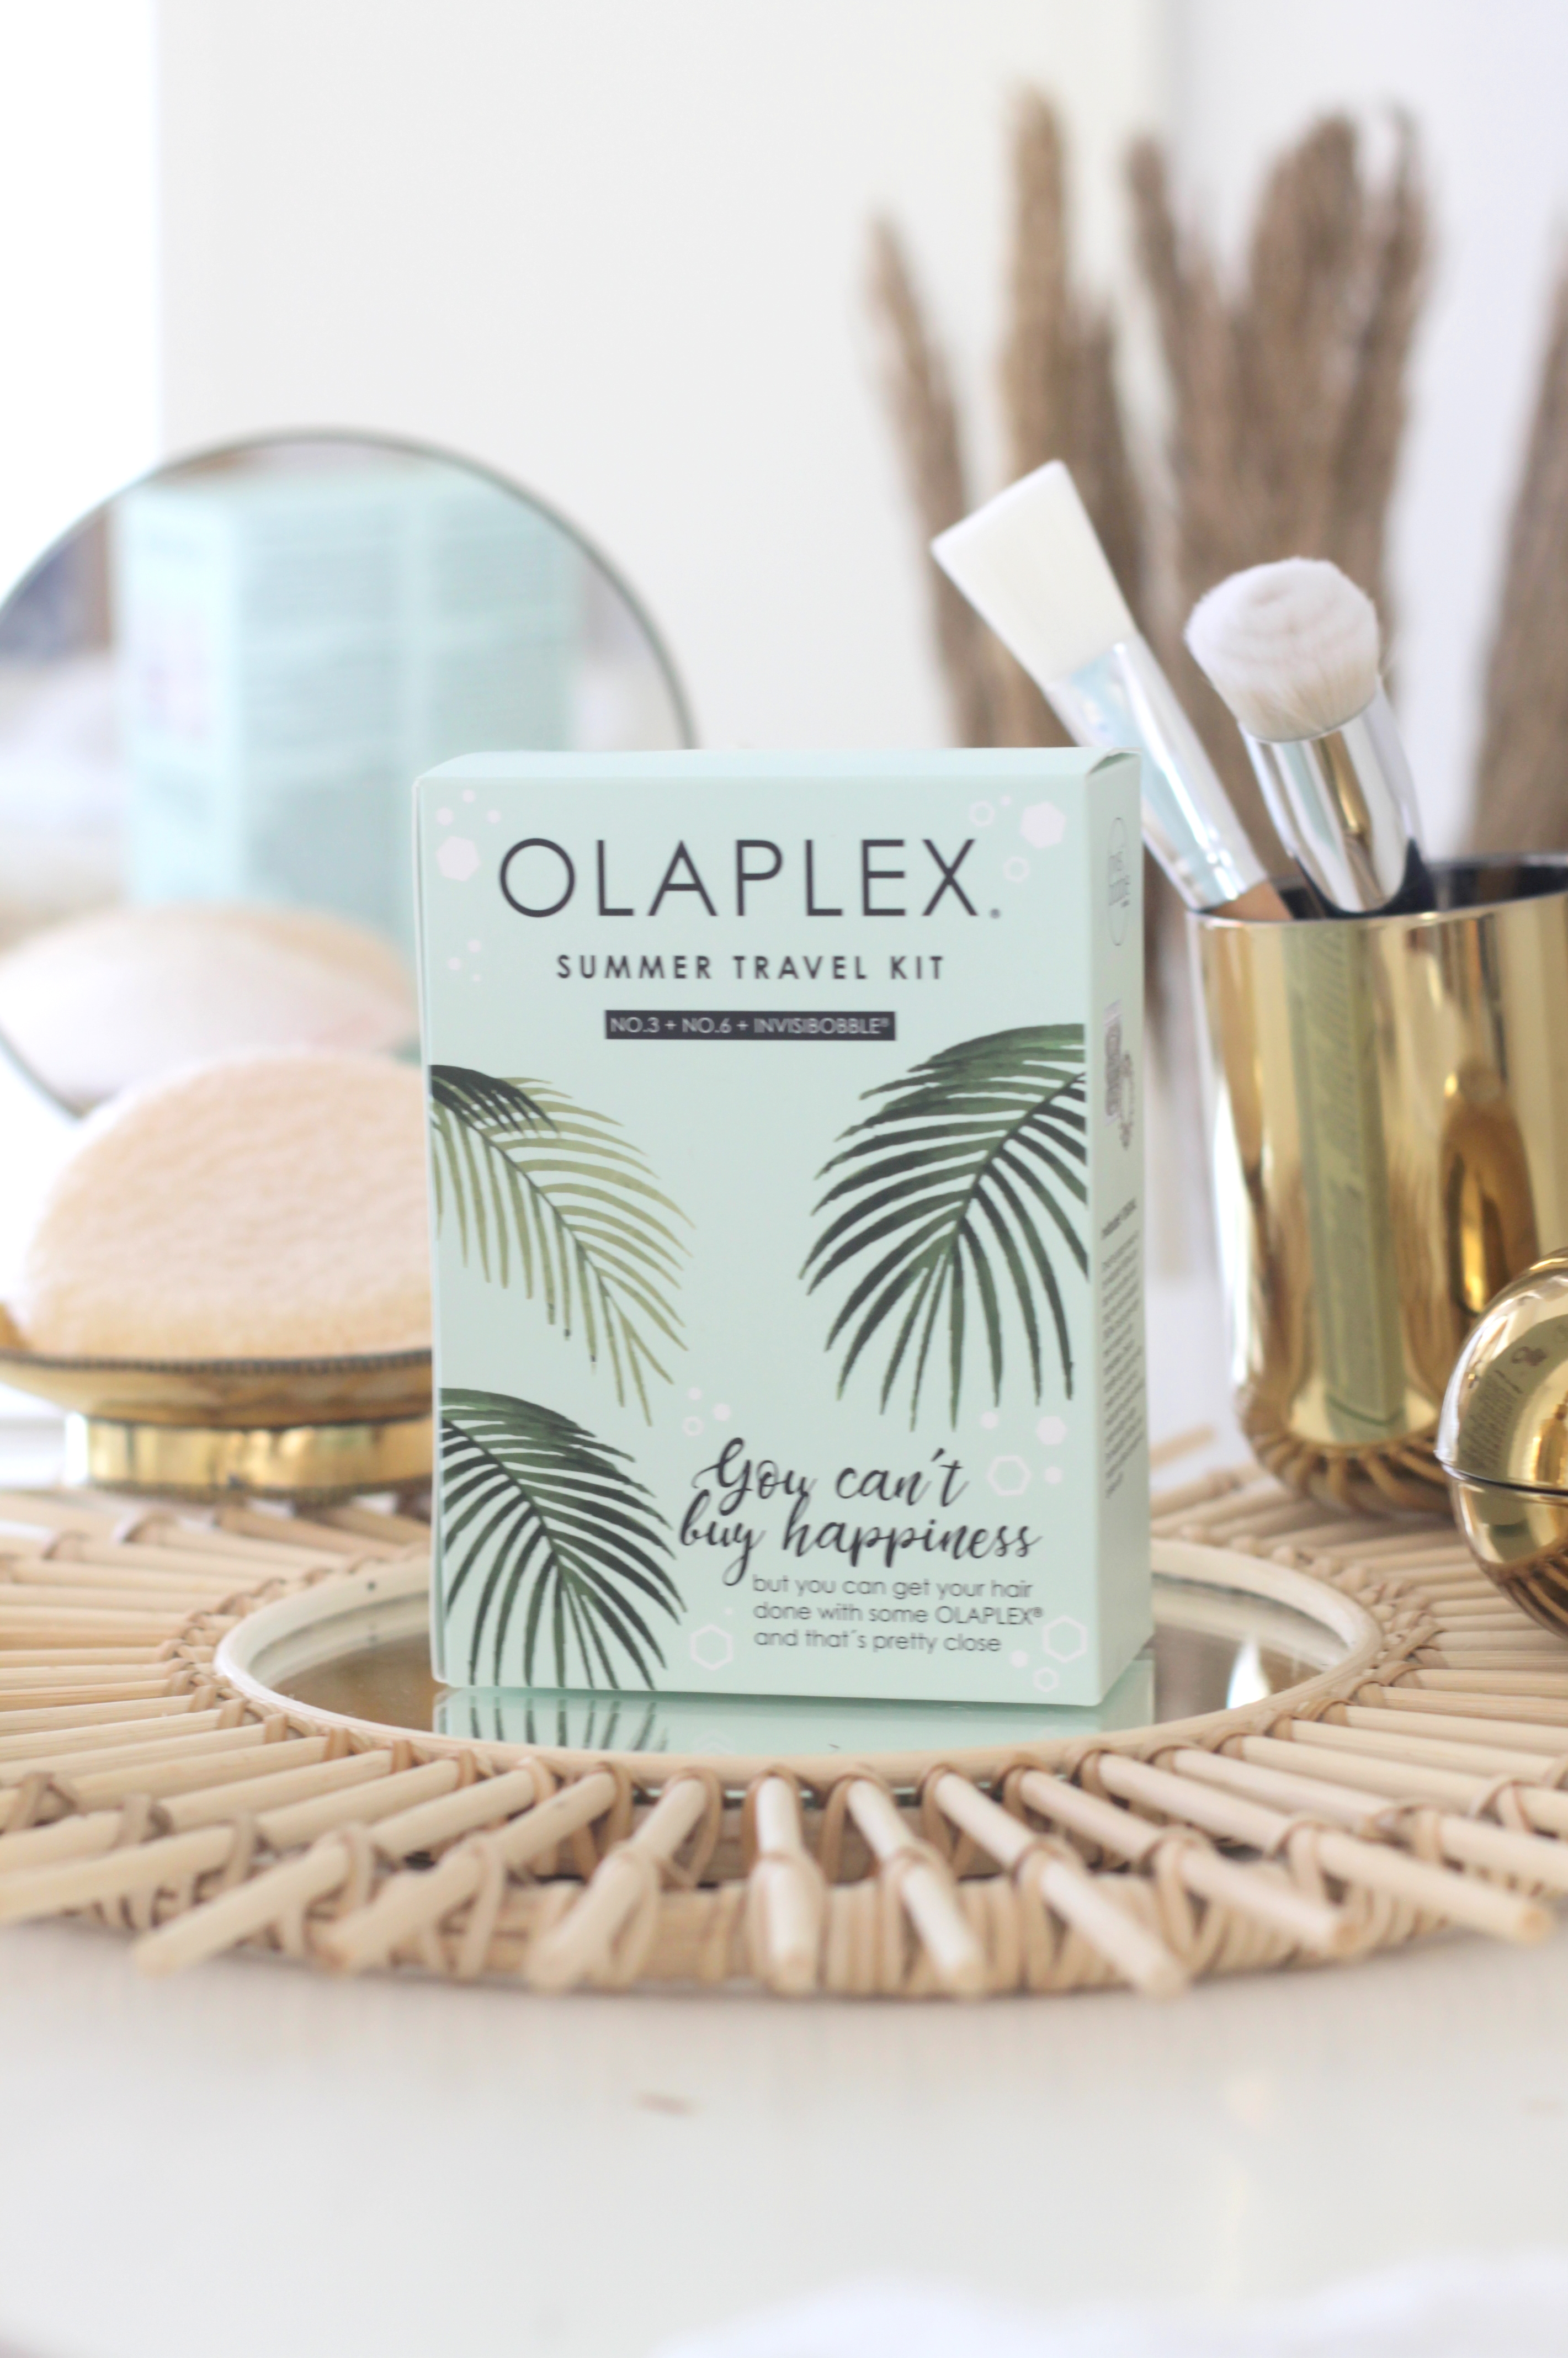 OLAPLEX Summer Travel Kit